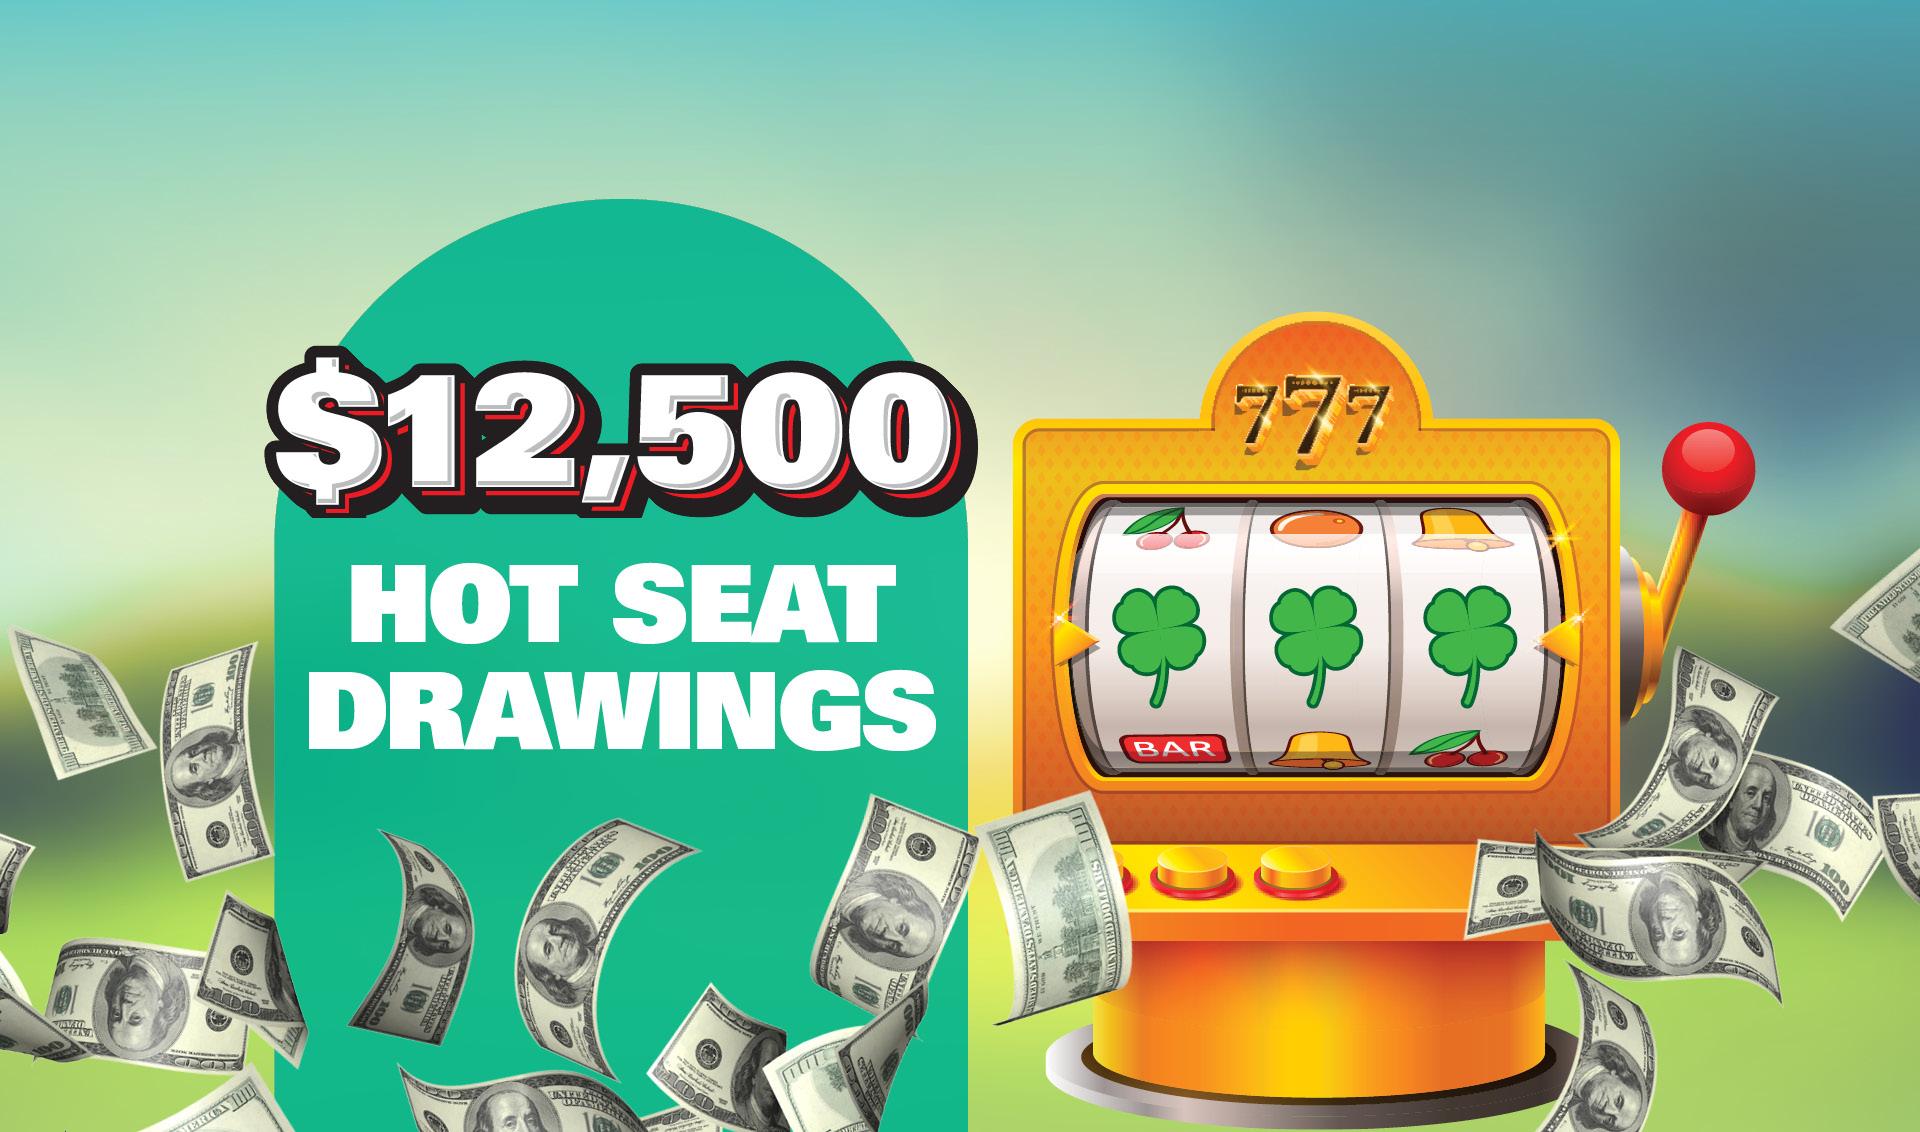 $12,500 Hot Seat Drawings